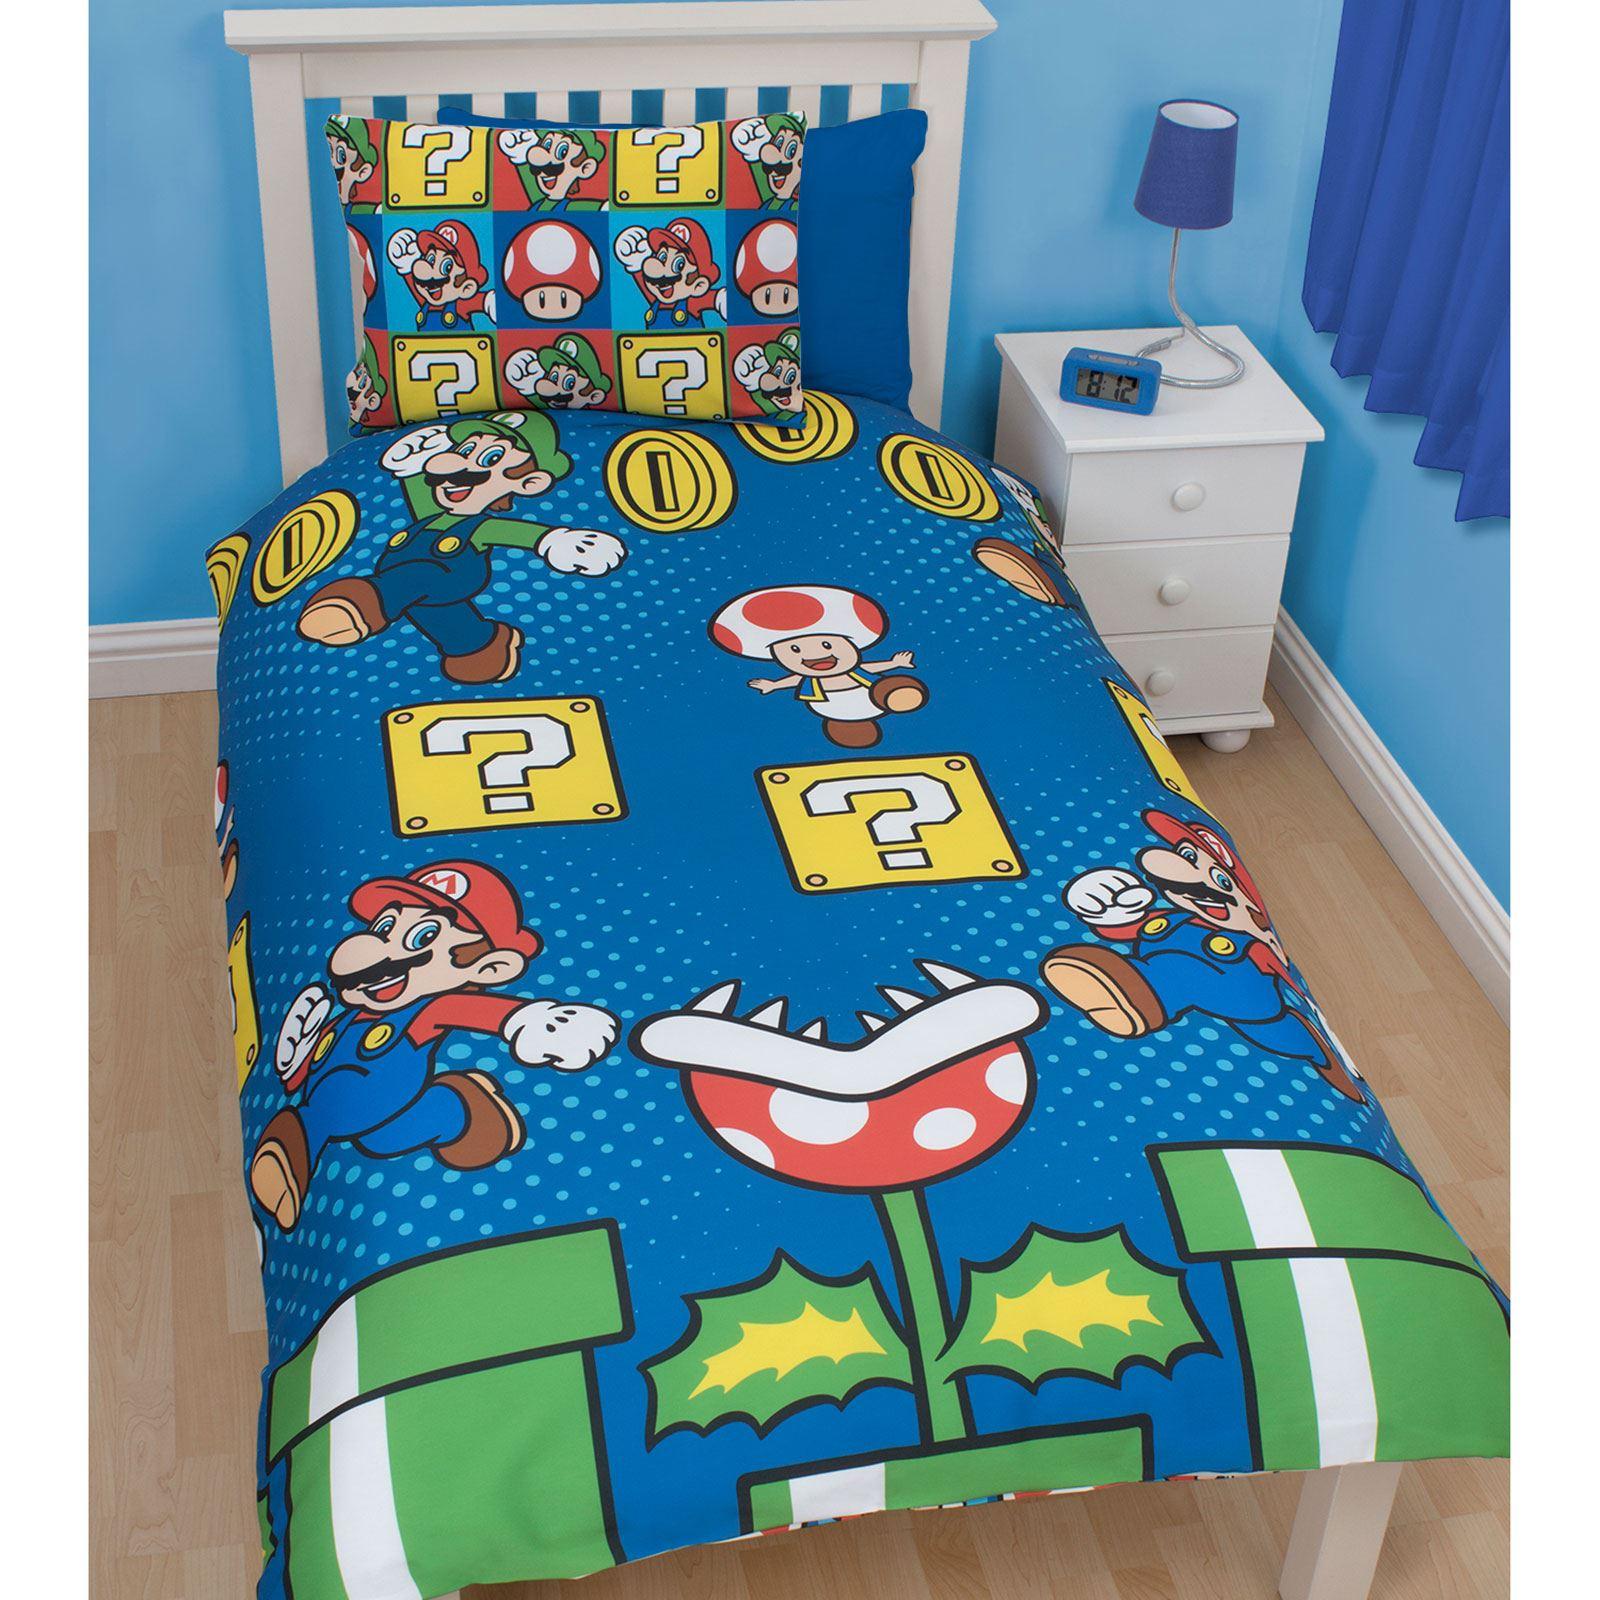 nintendo super mario luigi saut simple parure de lit literie enfant ebay. Black Bedroom Furniture Sets. Home Design Ideas